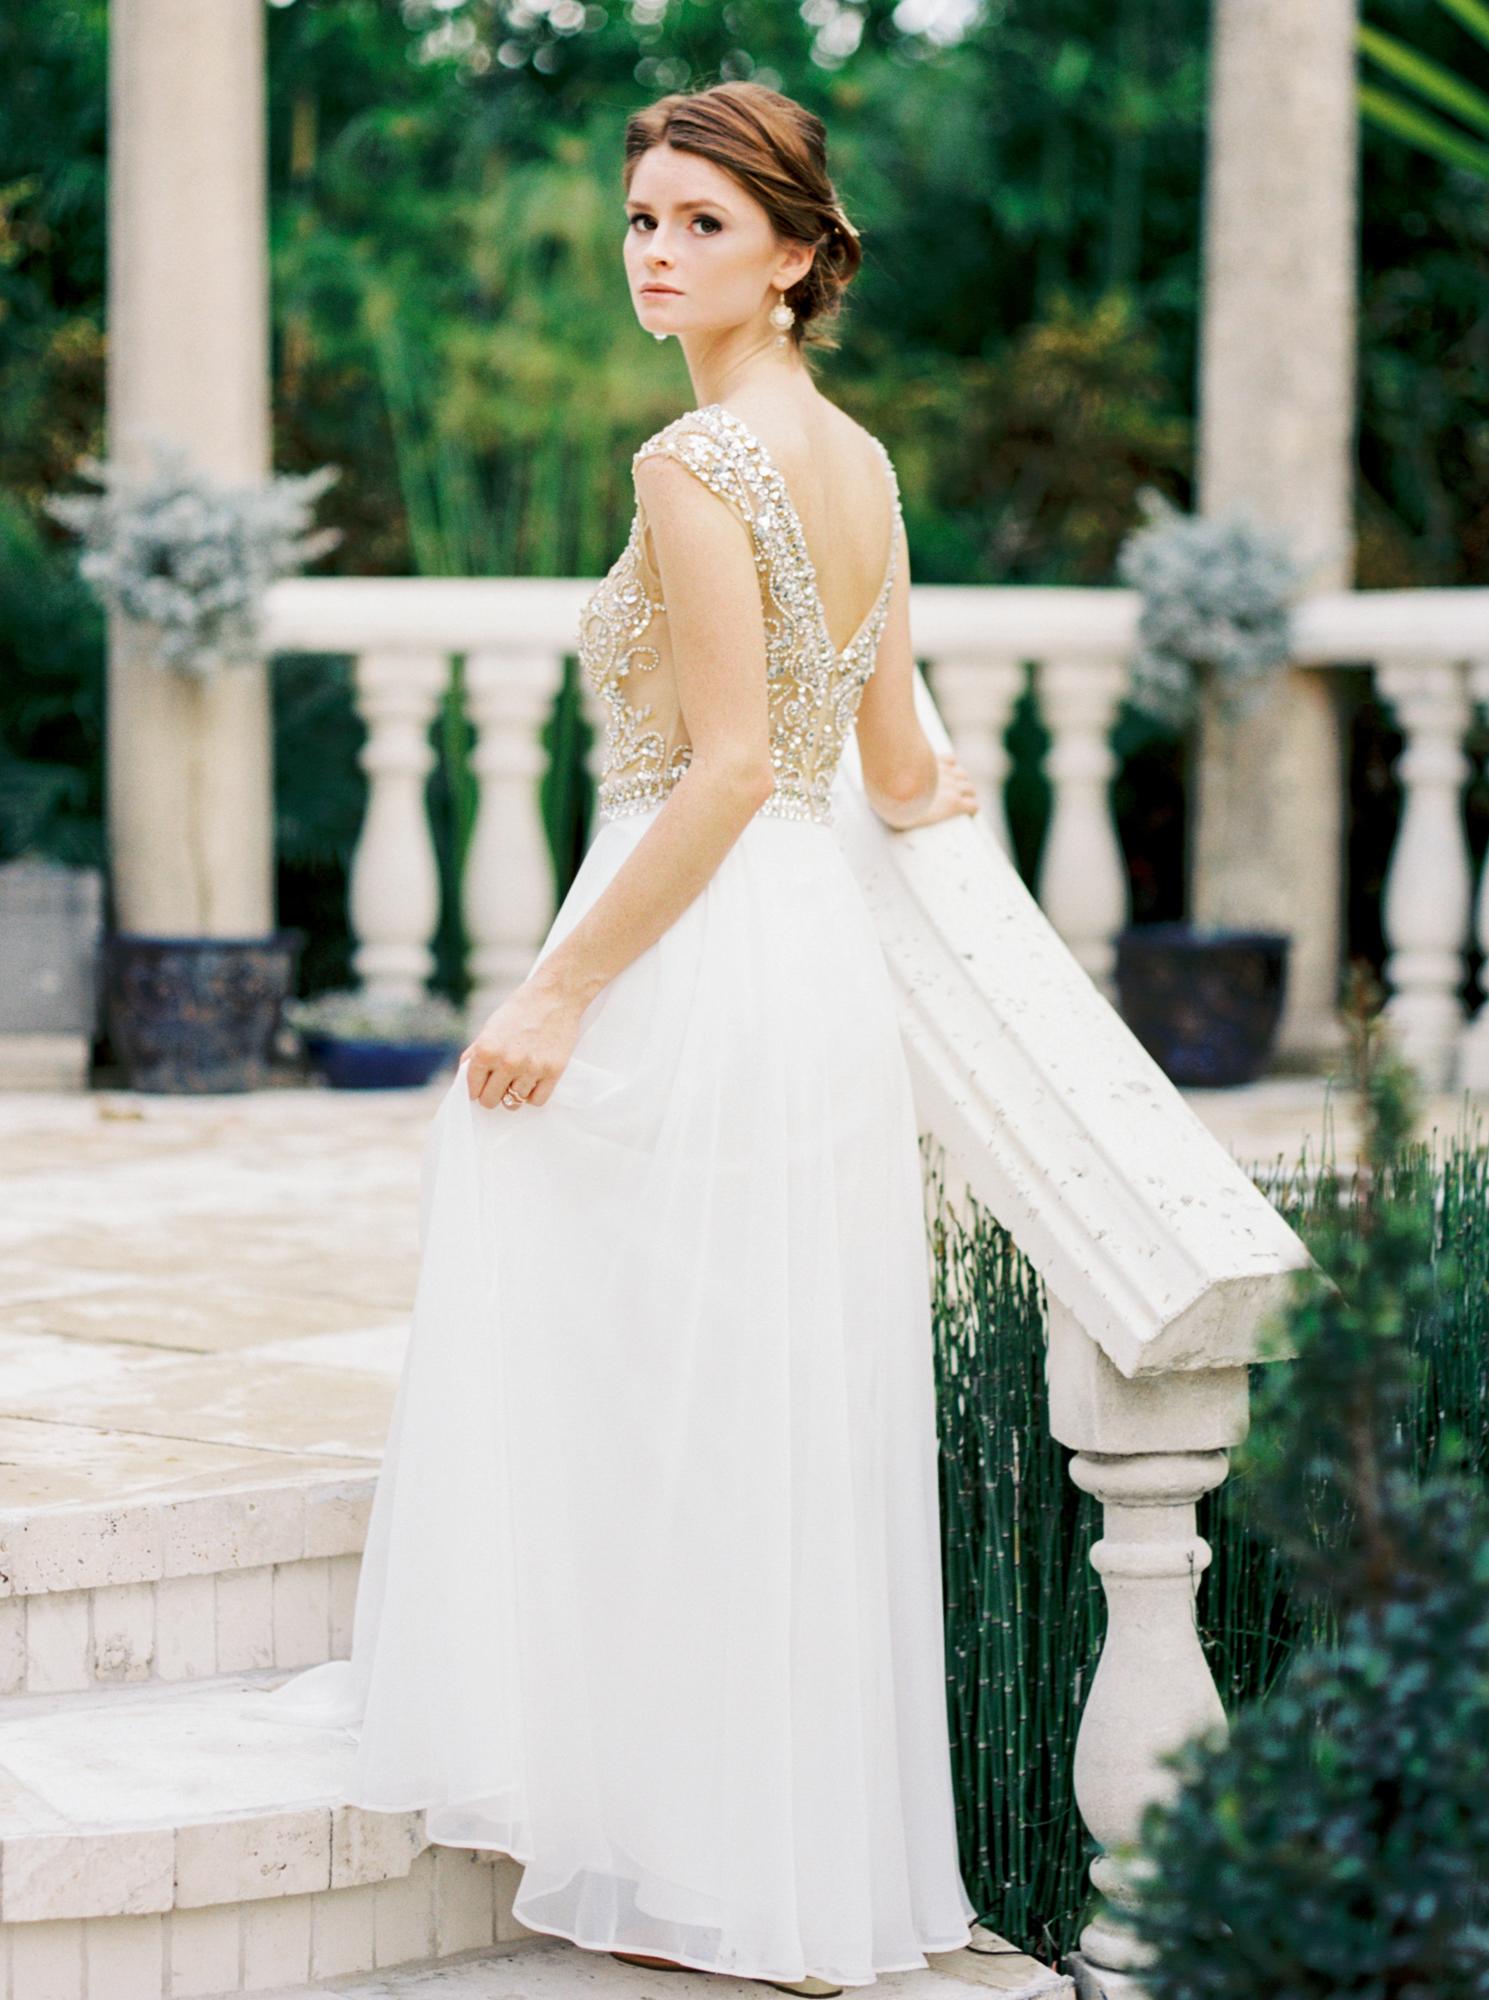 valkaria gardens palm bay FL bride wedding photos